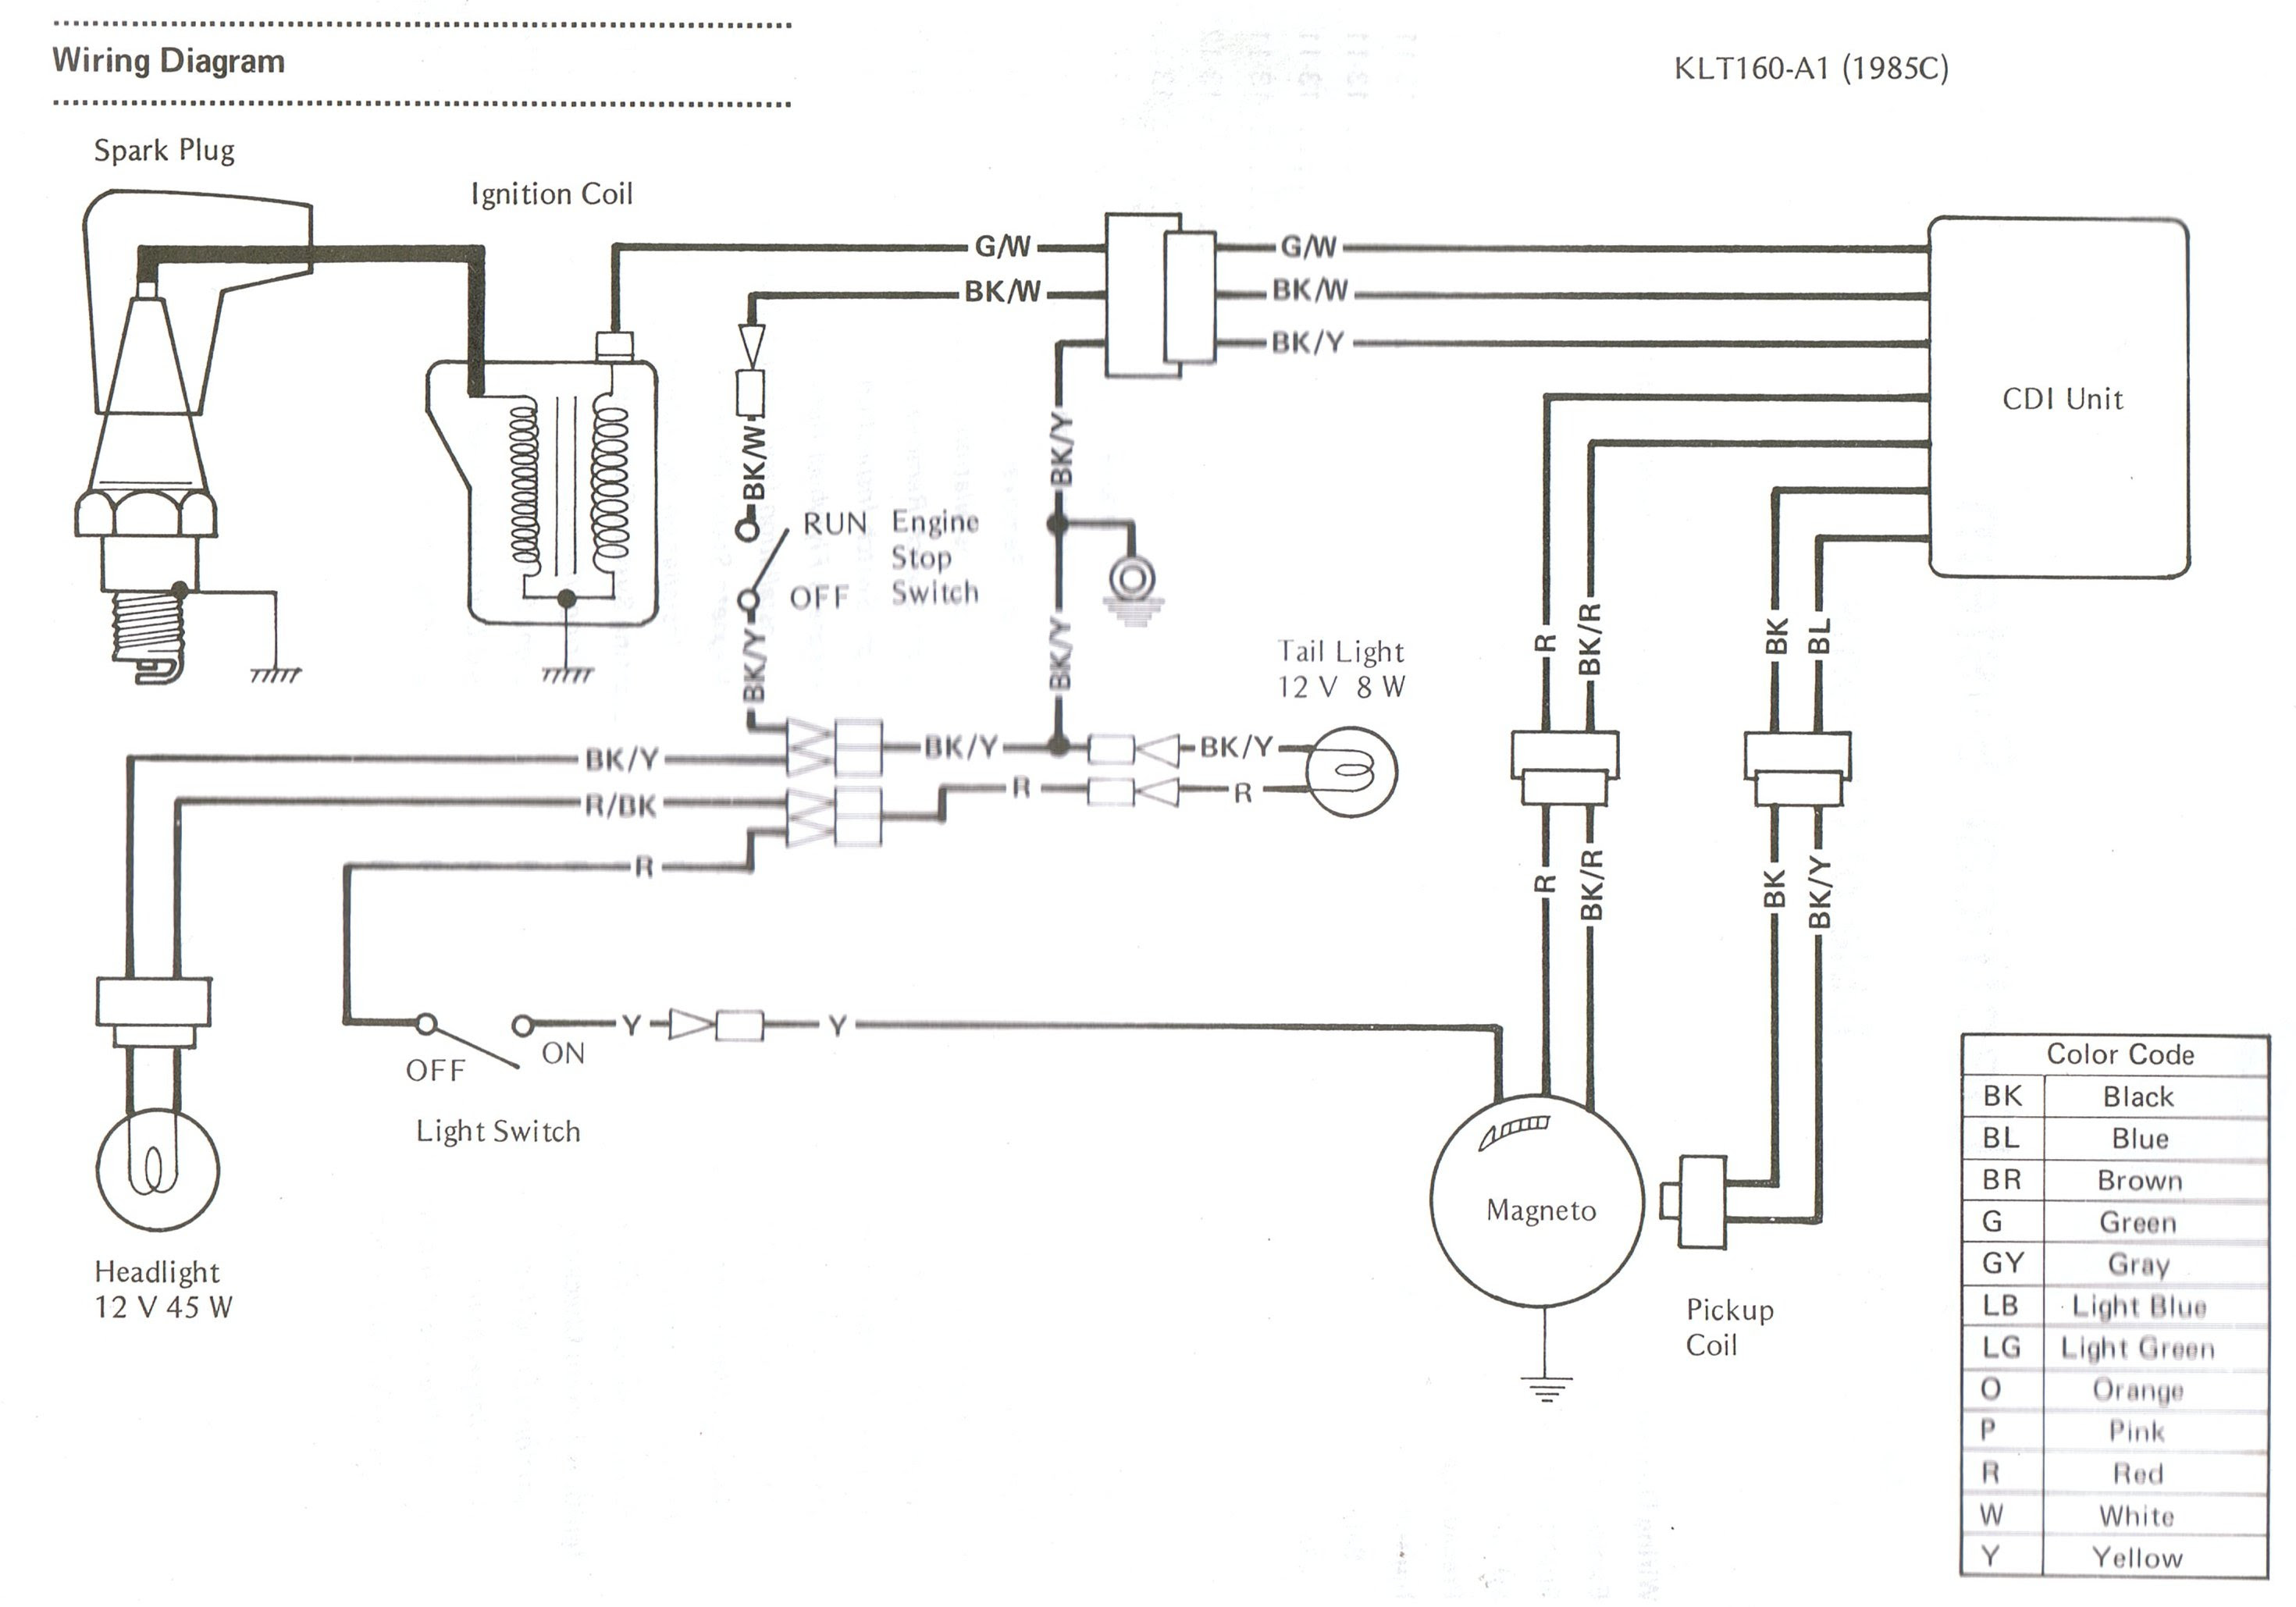 1985 Kawasaki Wiring Diagram Wiring Diagram Motor A Motor A Frankmotors Es